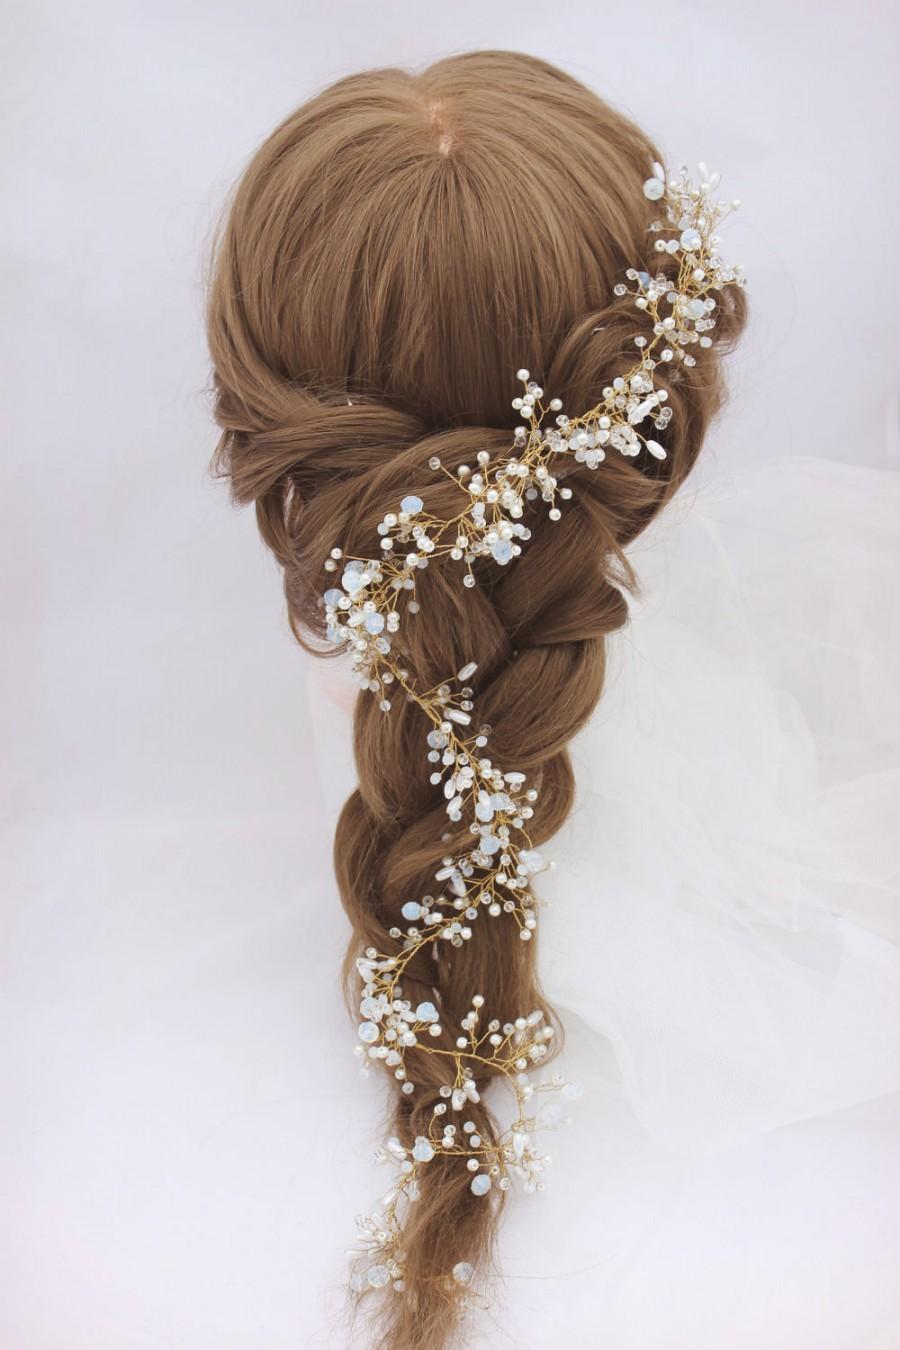 Mariage - Long hair vine Crystal golden wreath Headband Hair Accessories Bridal Diadem Gold Accessory Delicate Bohemian Wreath Gold Baby's Breath Halo